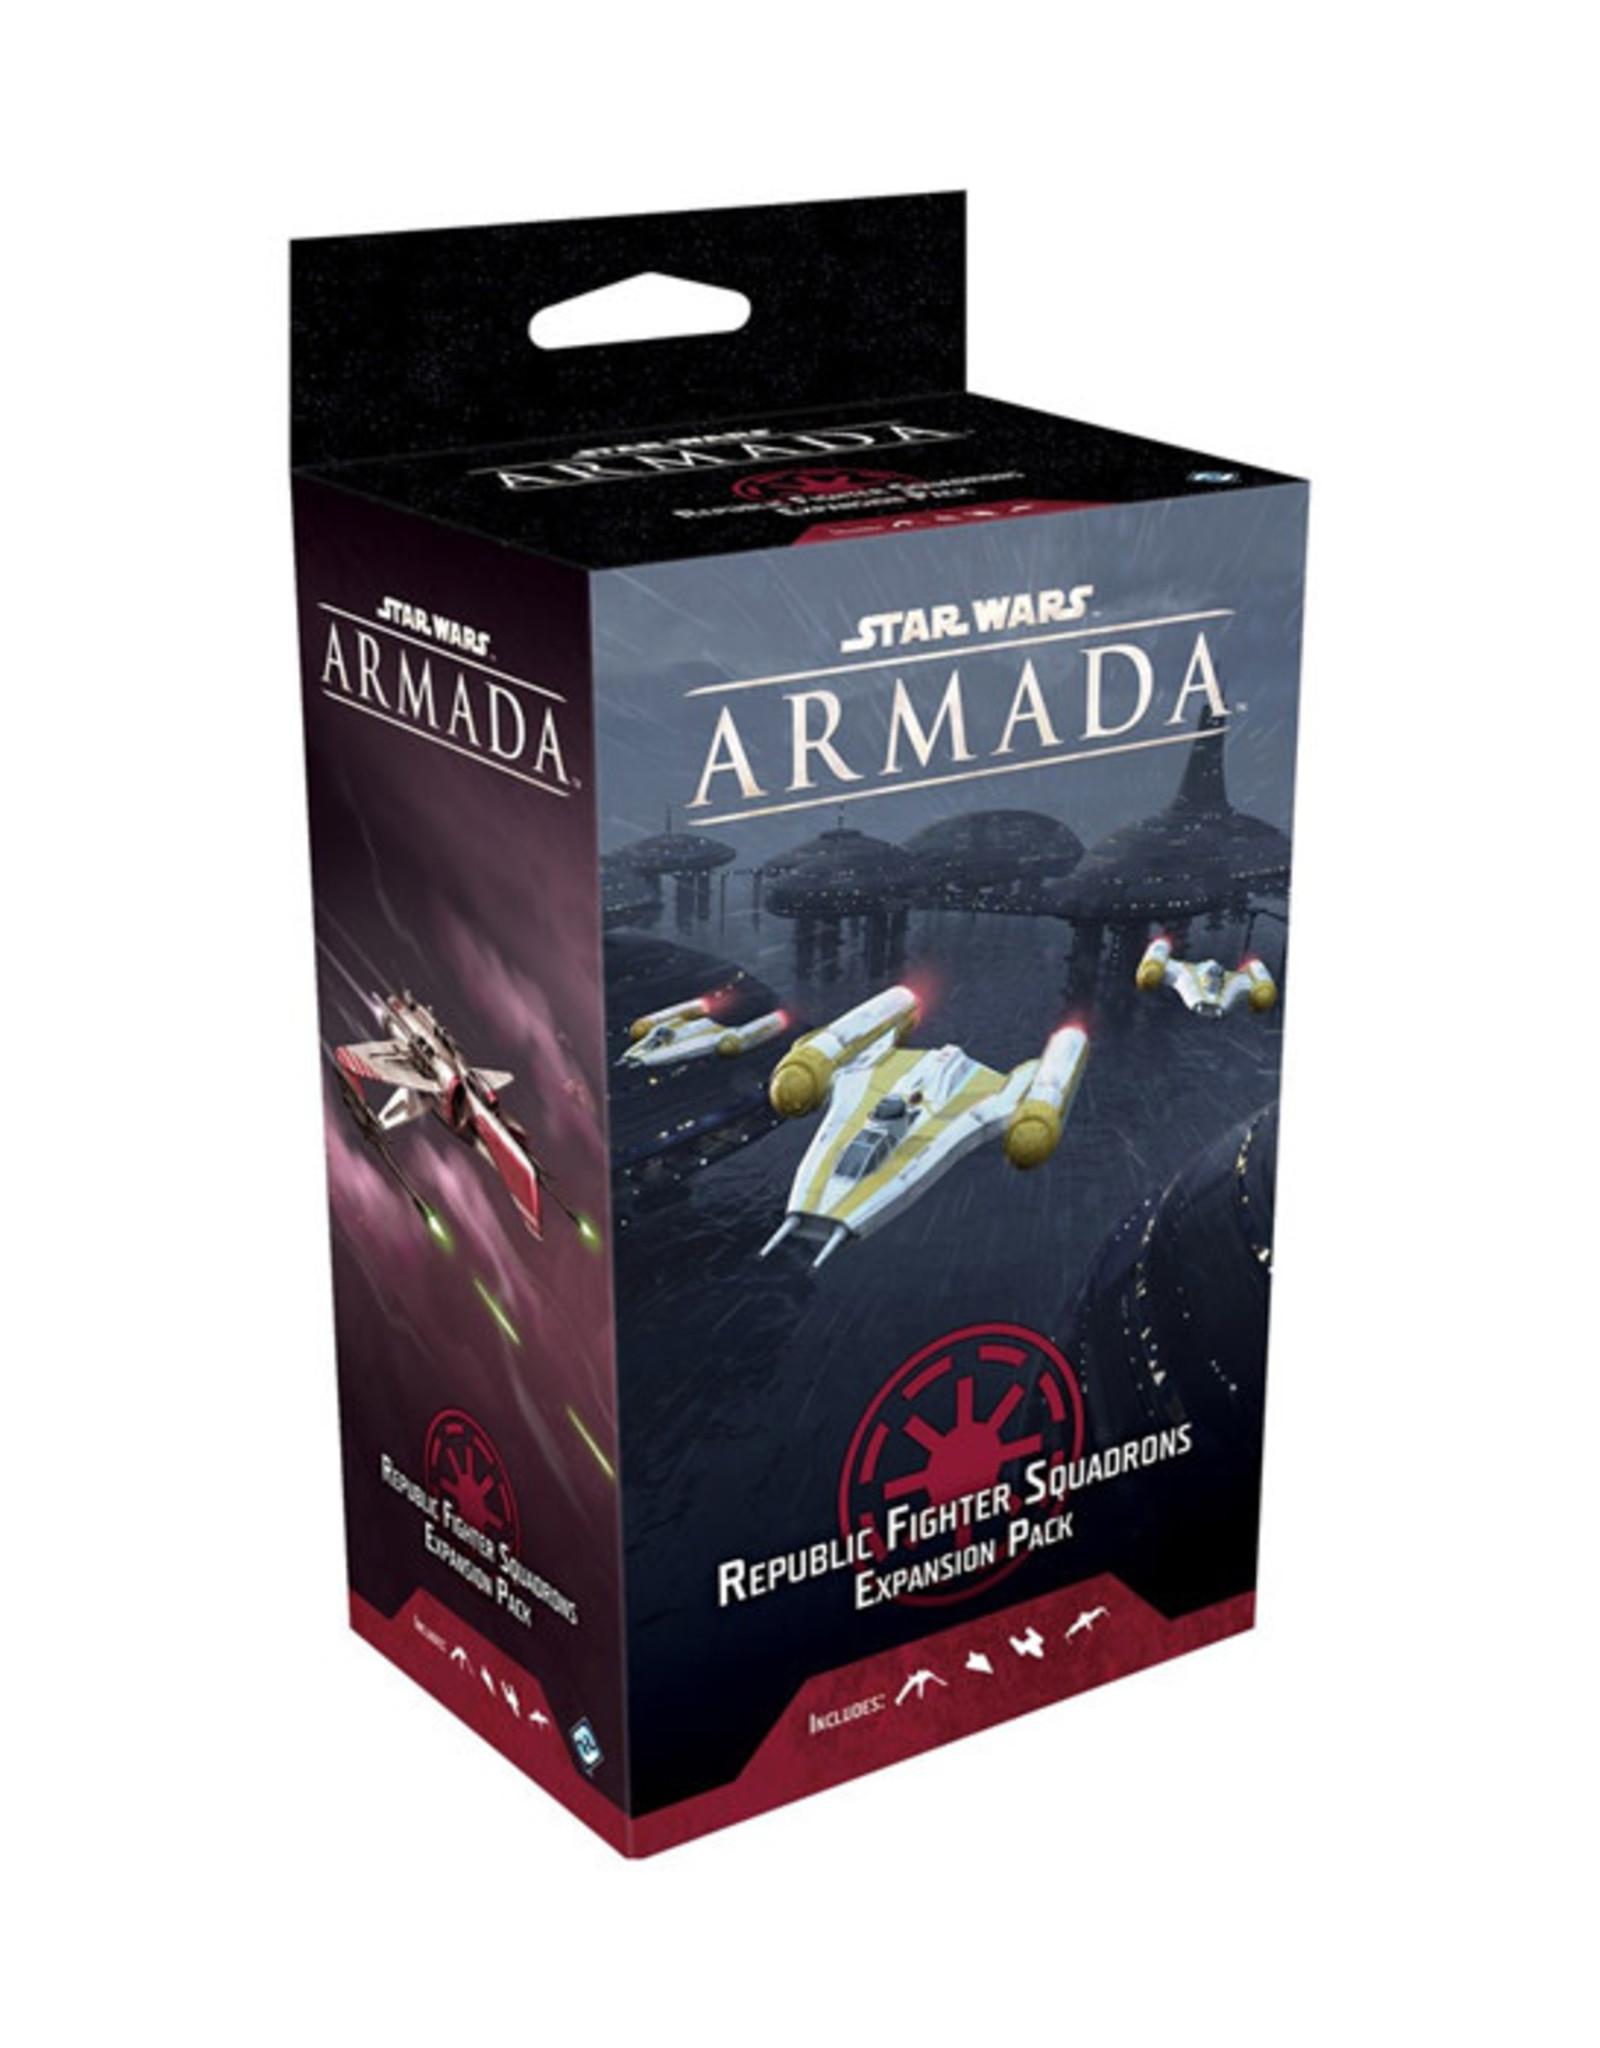 Fantasy Flight Games Star Wars: Armada - Republic Fighter Squadrons